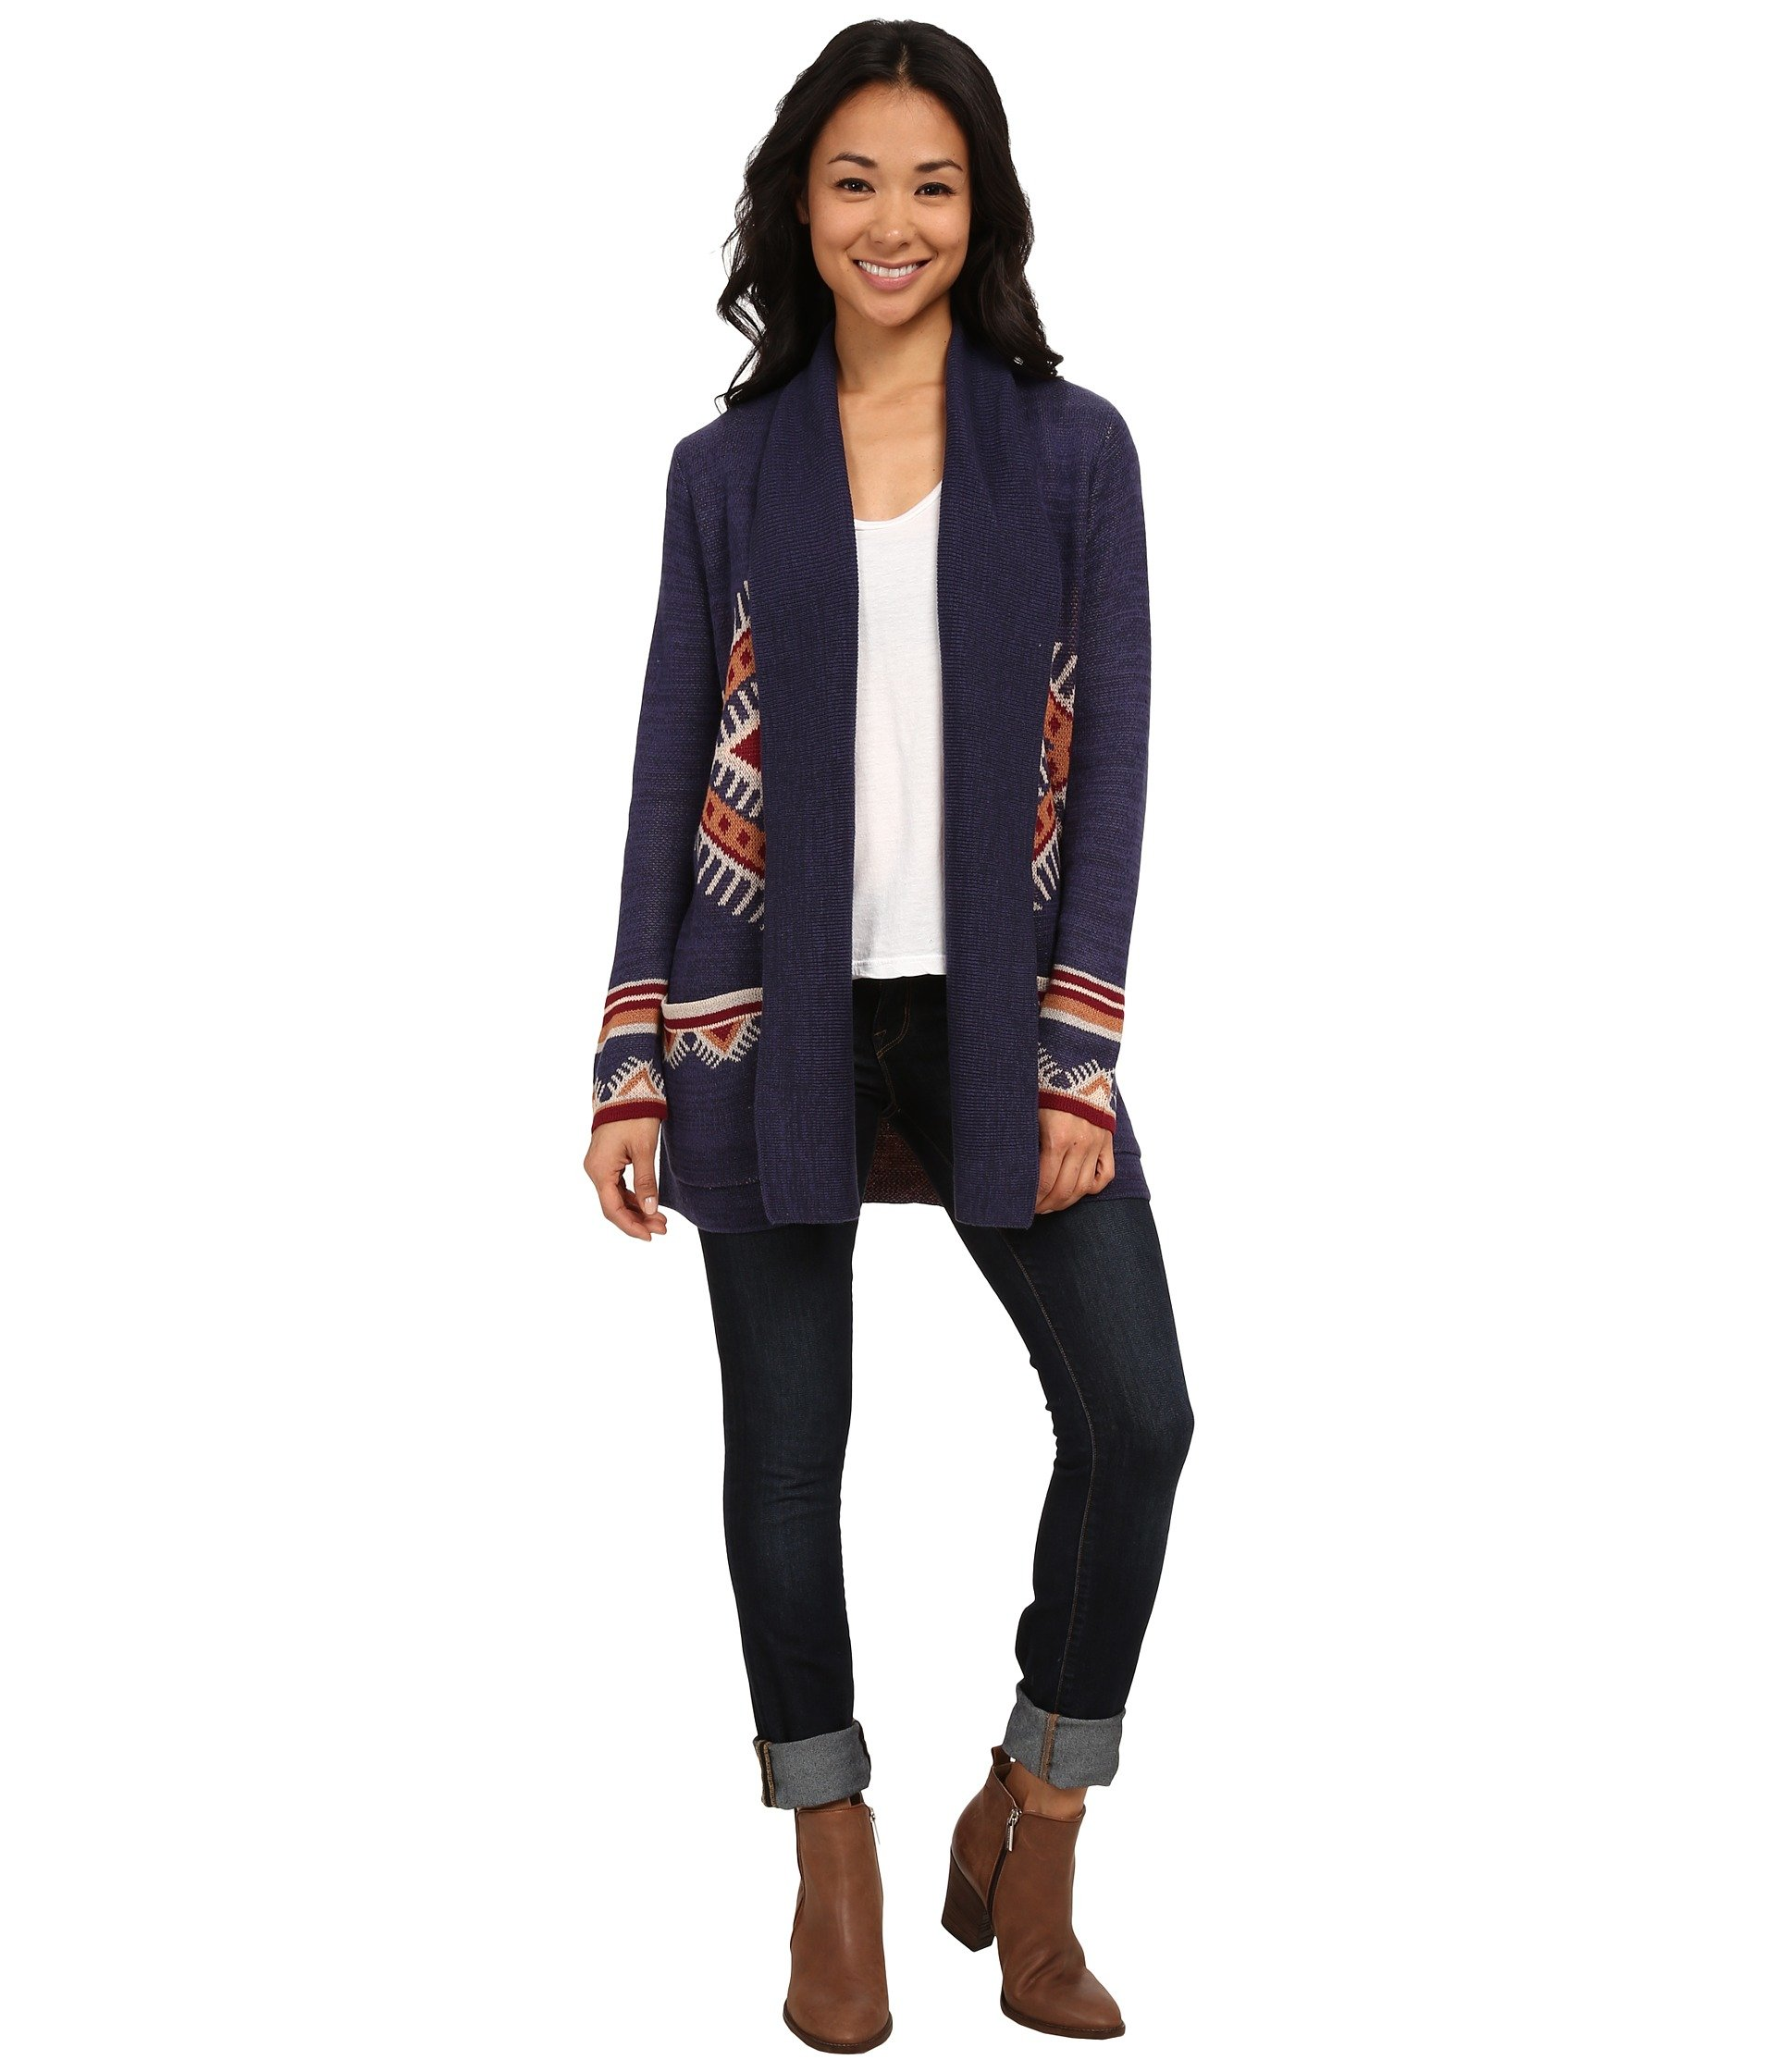 Billabong Junior's Winter Solstice Printed Cardigan Sweater, Midnight, Medium